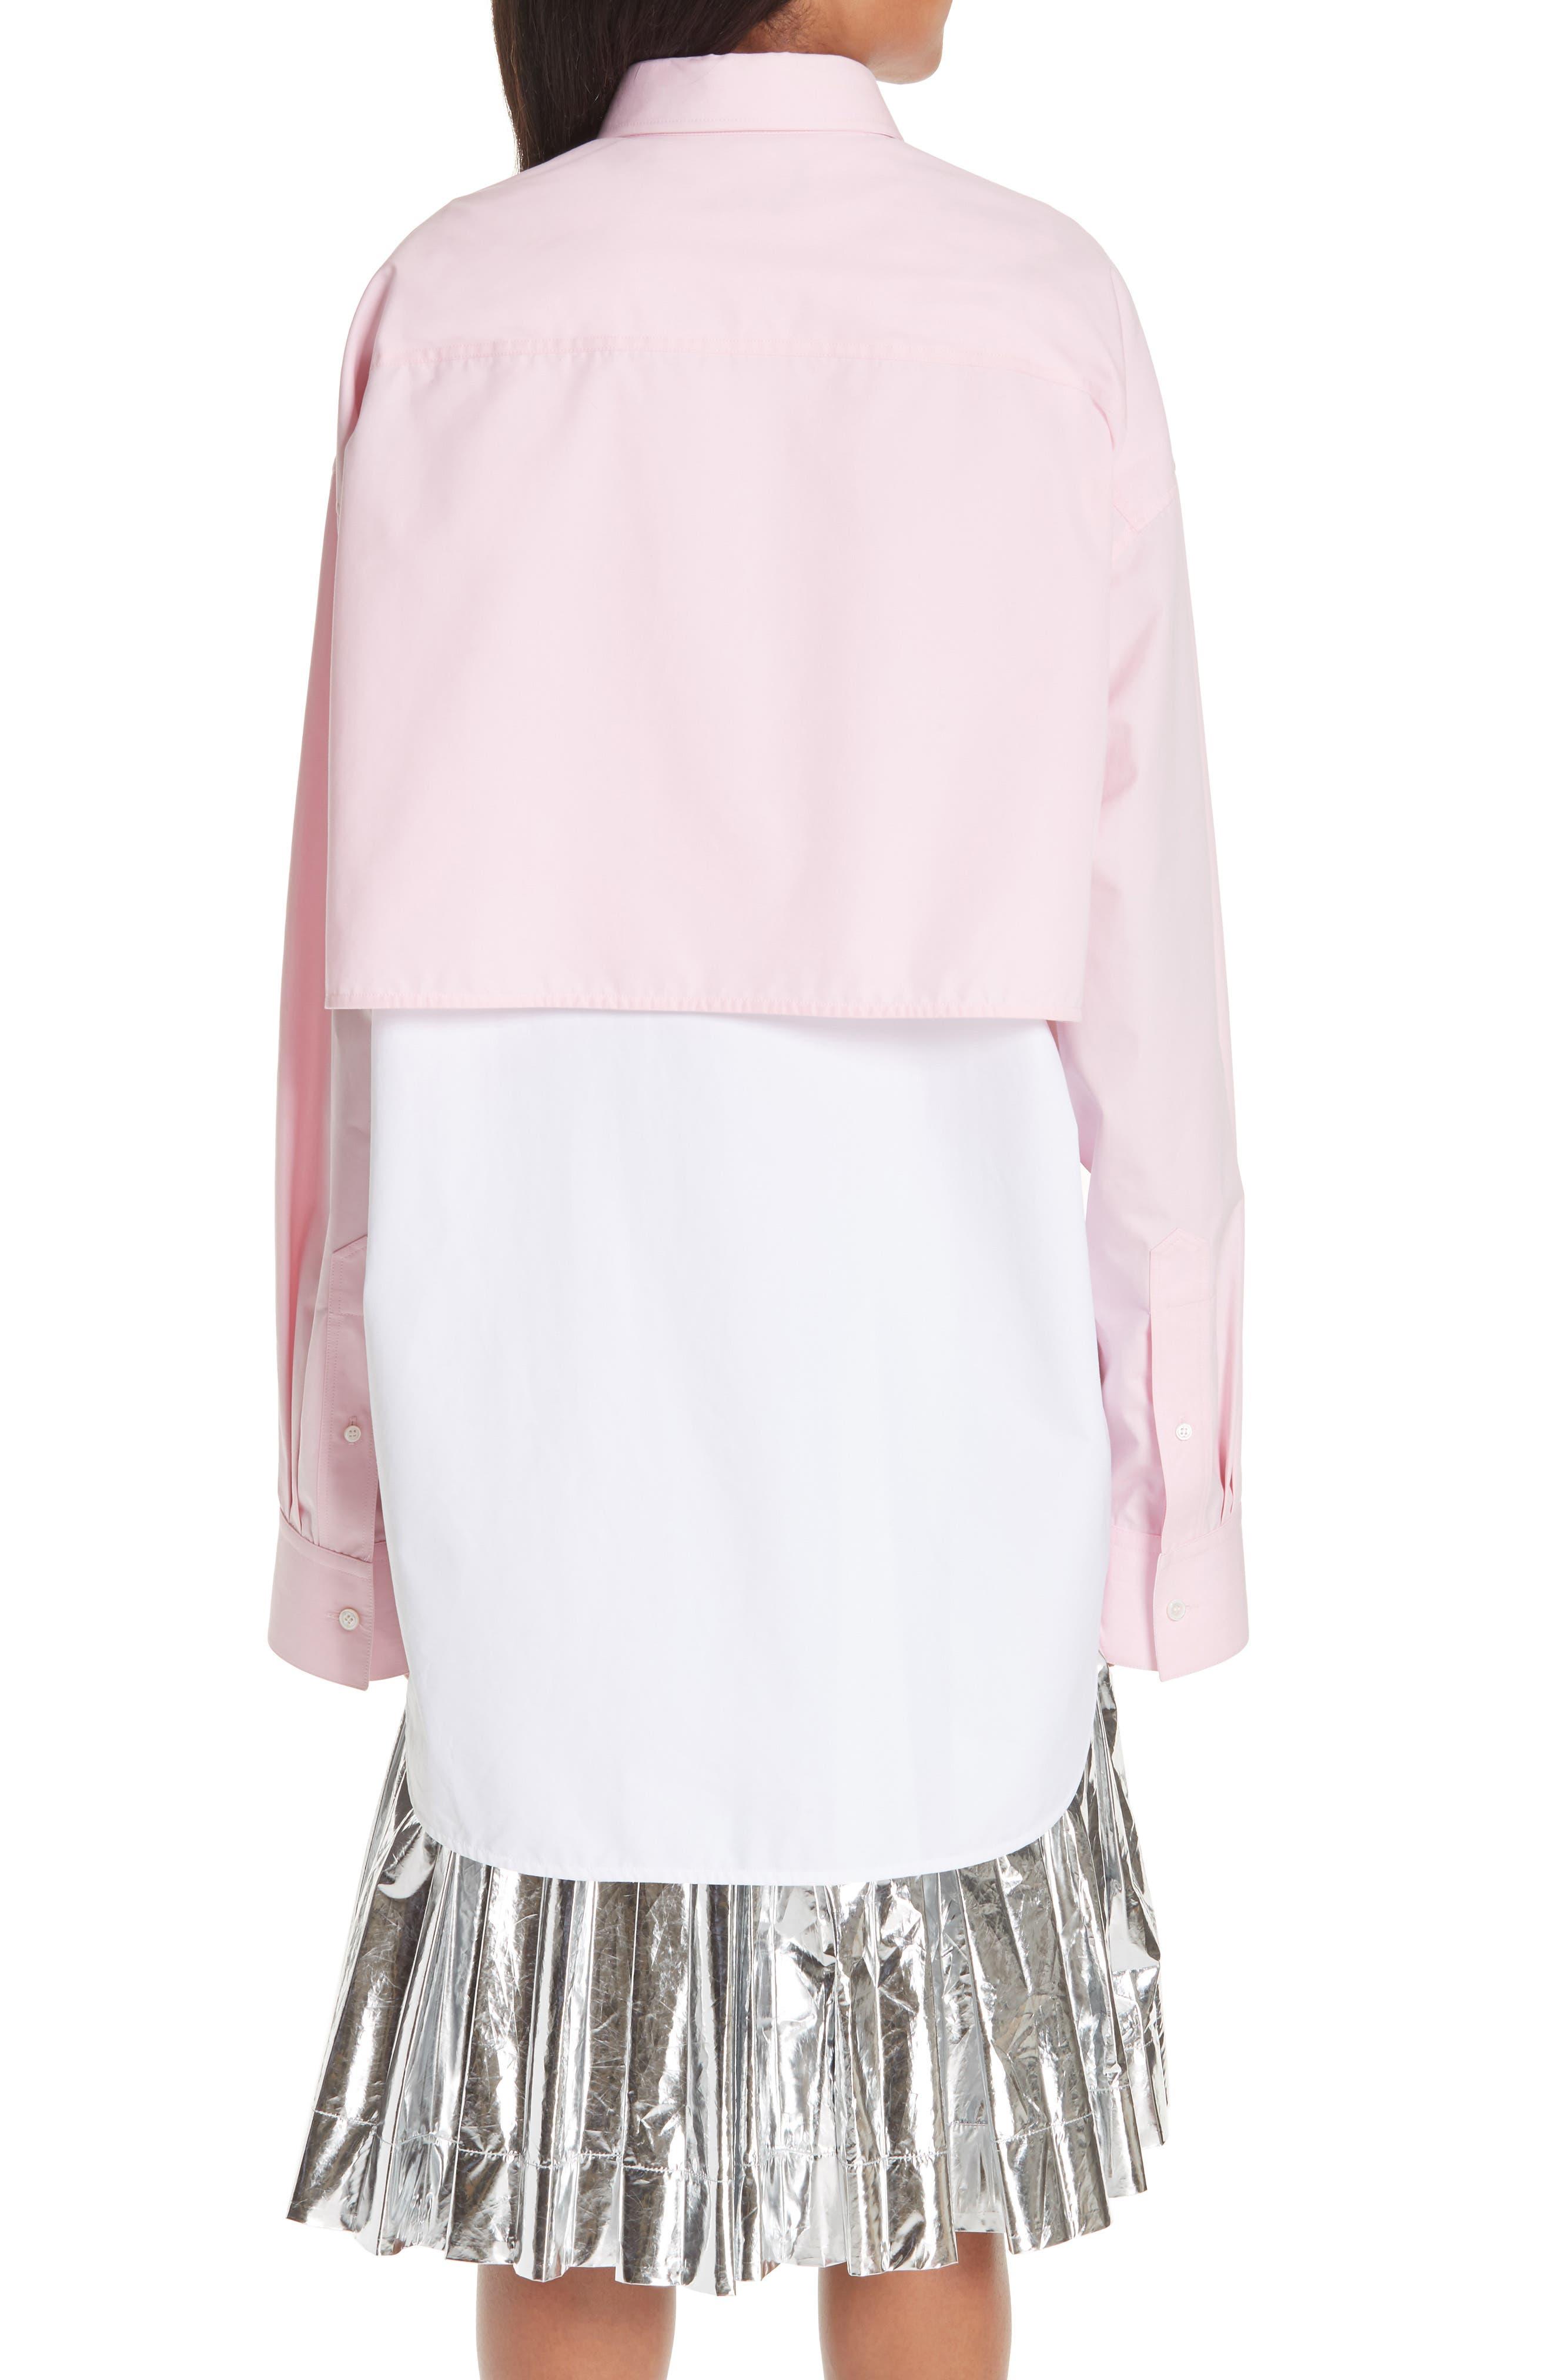 CALVIN KLEIN 205W39NYC, Layered Cotton Poplin Shirt, Alternate thumbnail 4, color, ROSE OPTIC WHITE